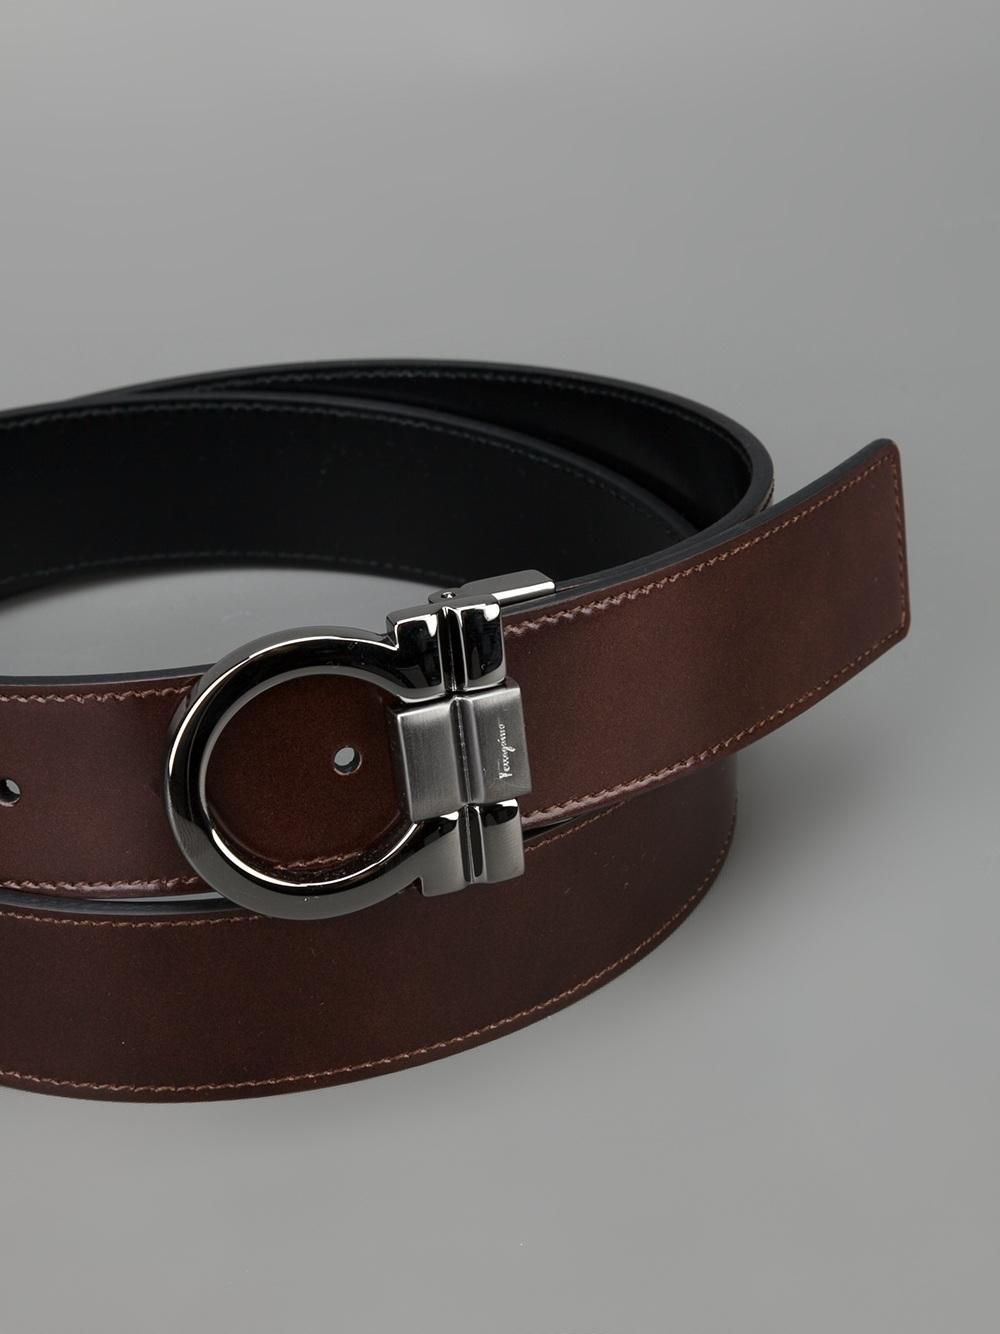 Lyst Ferragamo Embossed Brand Buckle Belt In Brown For Men